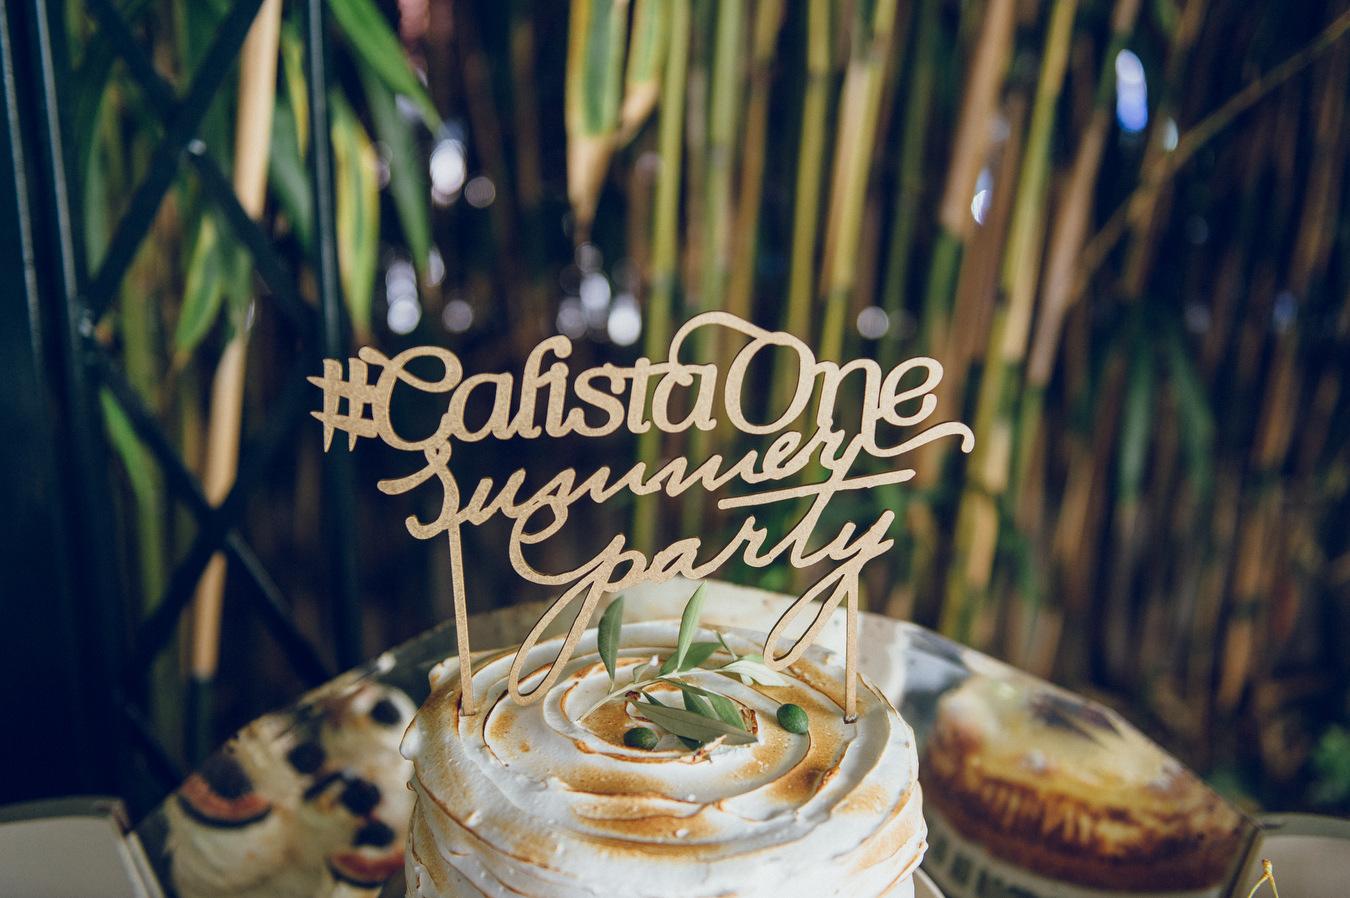 calista-one-lista-de-bodas-online-blog-de-bodas-calista-one-summer-party-2016-wedding-planner-dpleis-5